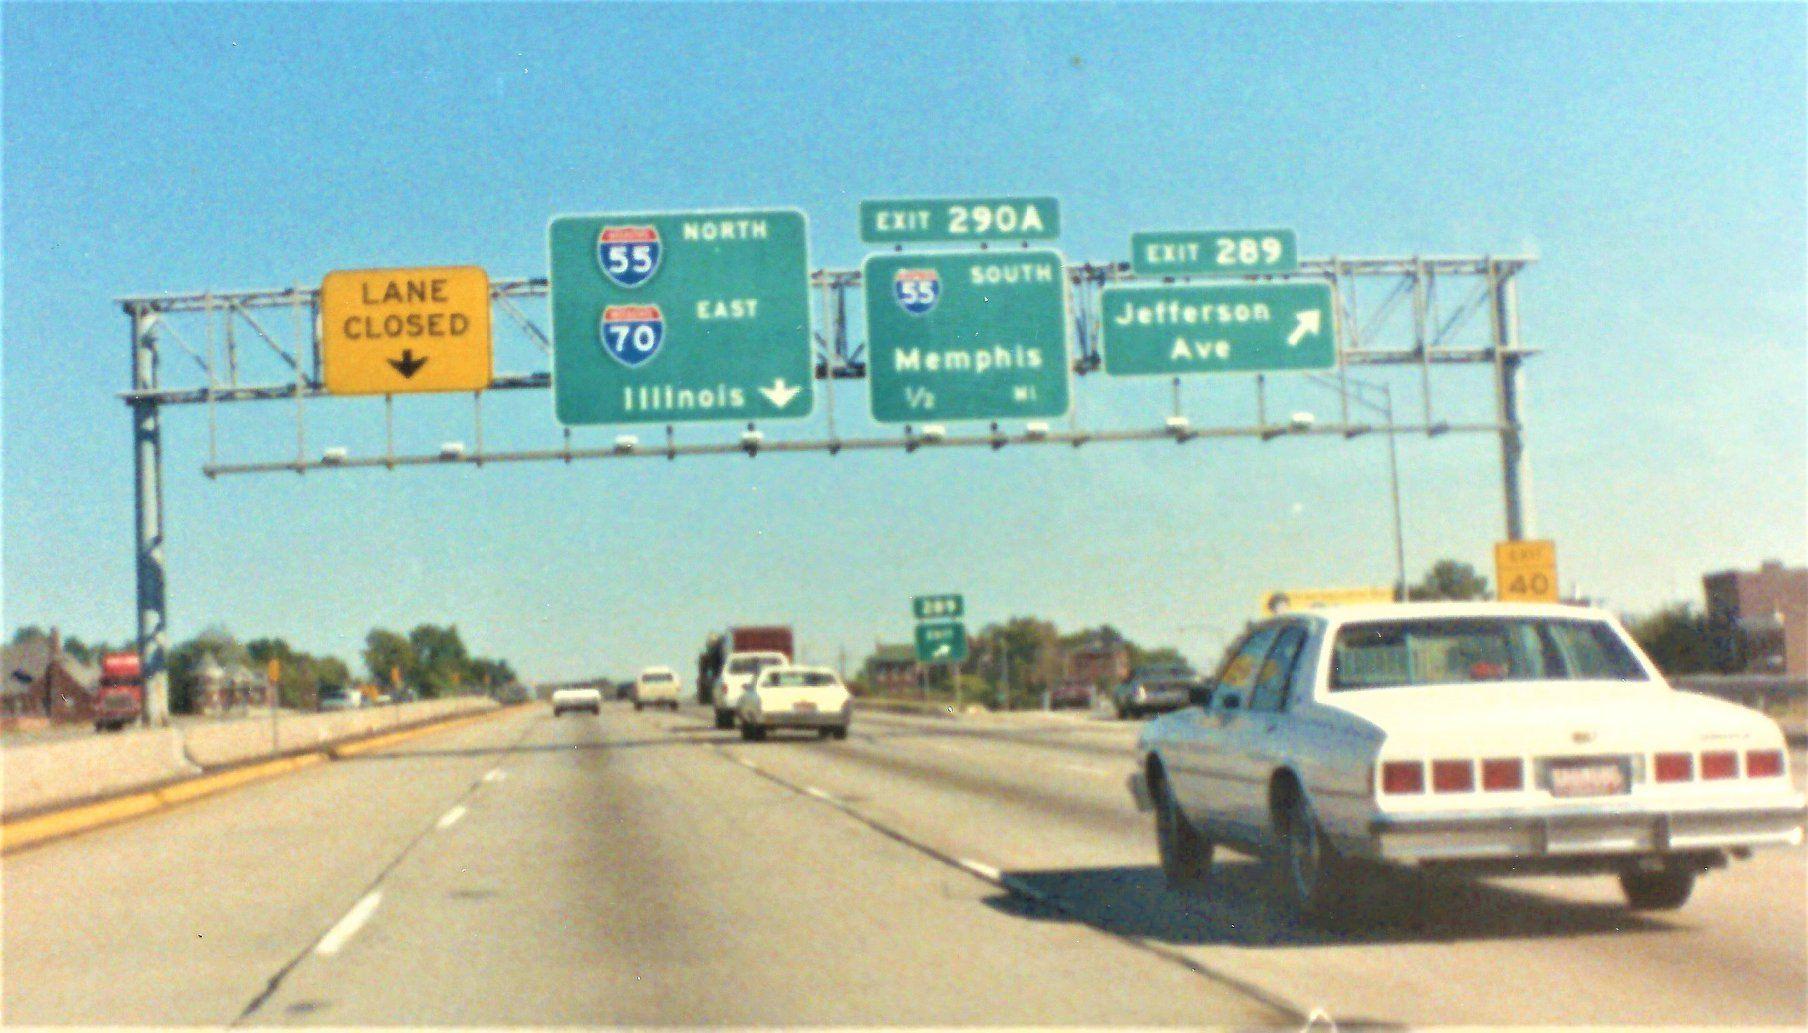 1989 Pin by Dwayne Pounds on Highways